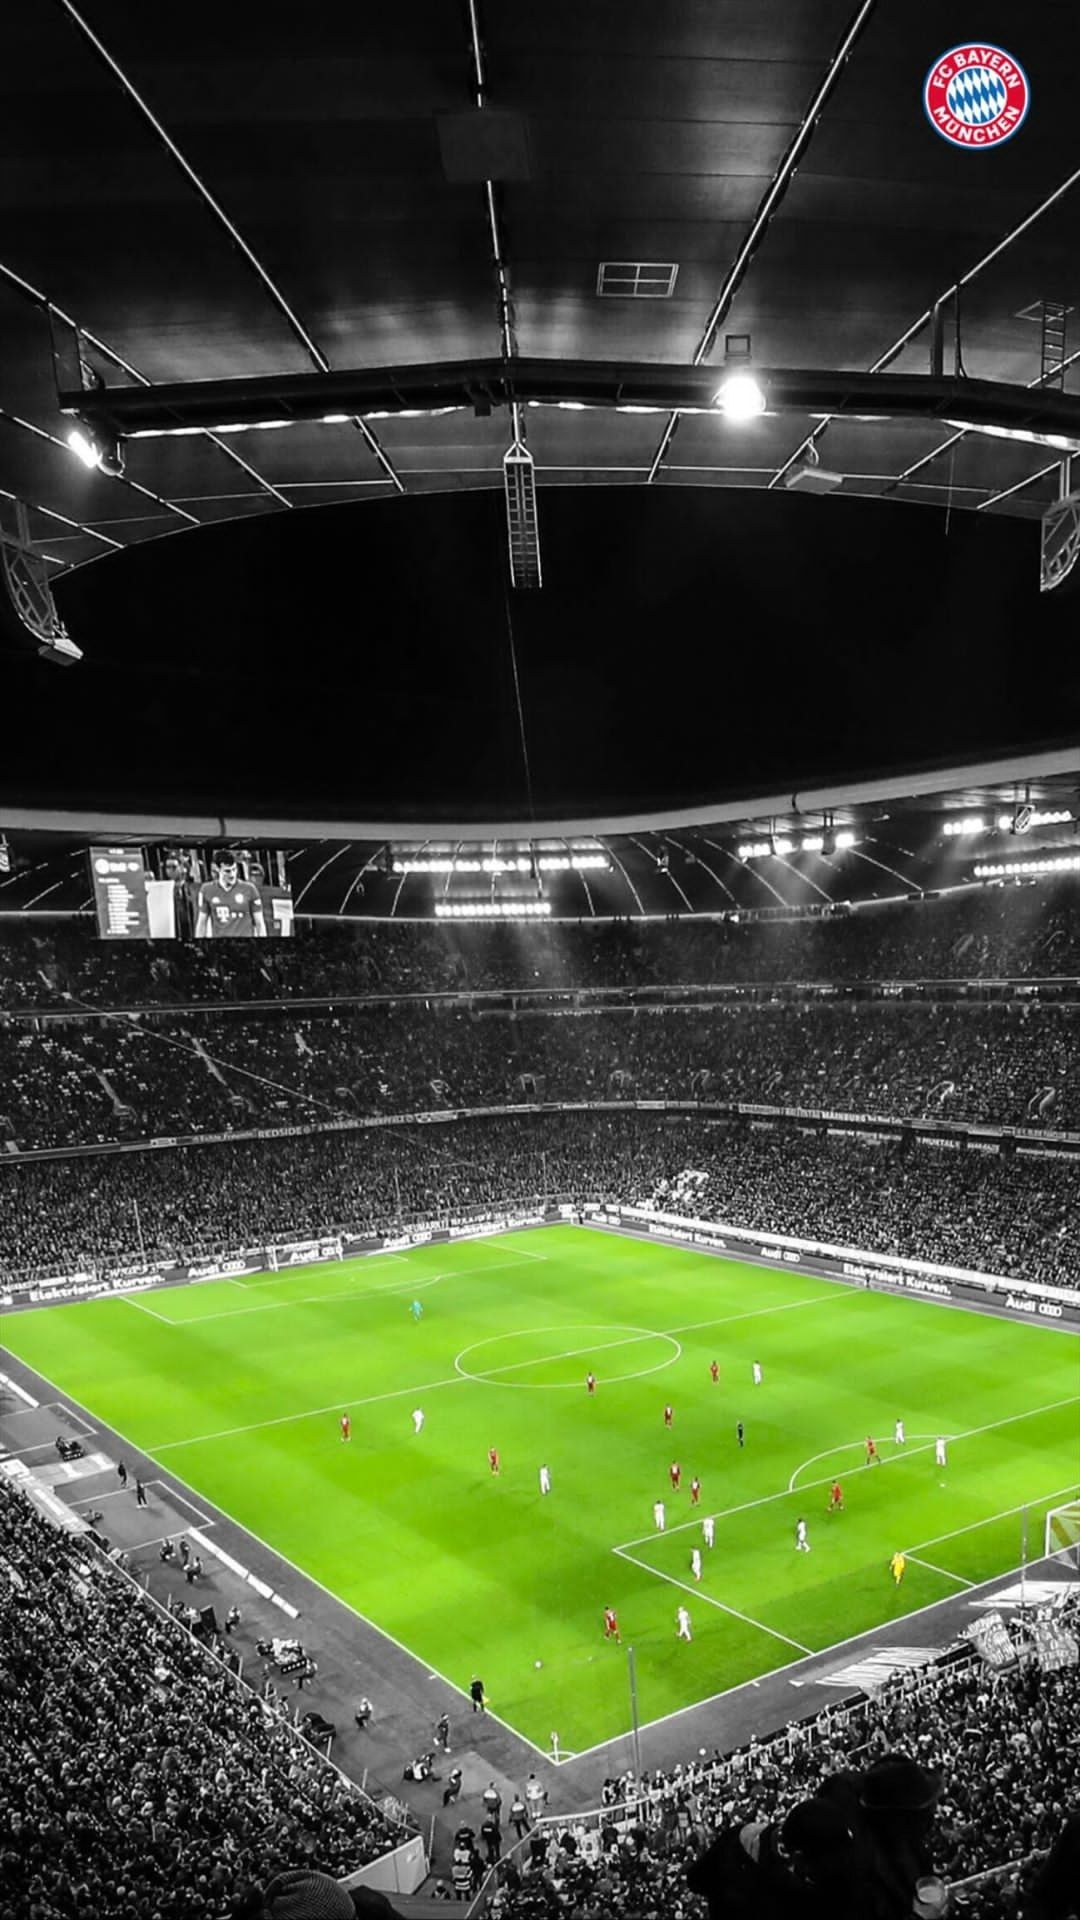 Football Stadium Wallpaper In 2020 Stadium Wallpaper Football Stadium Wallpaper Wallpaper